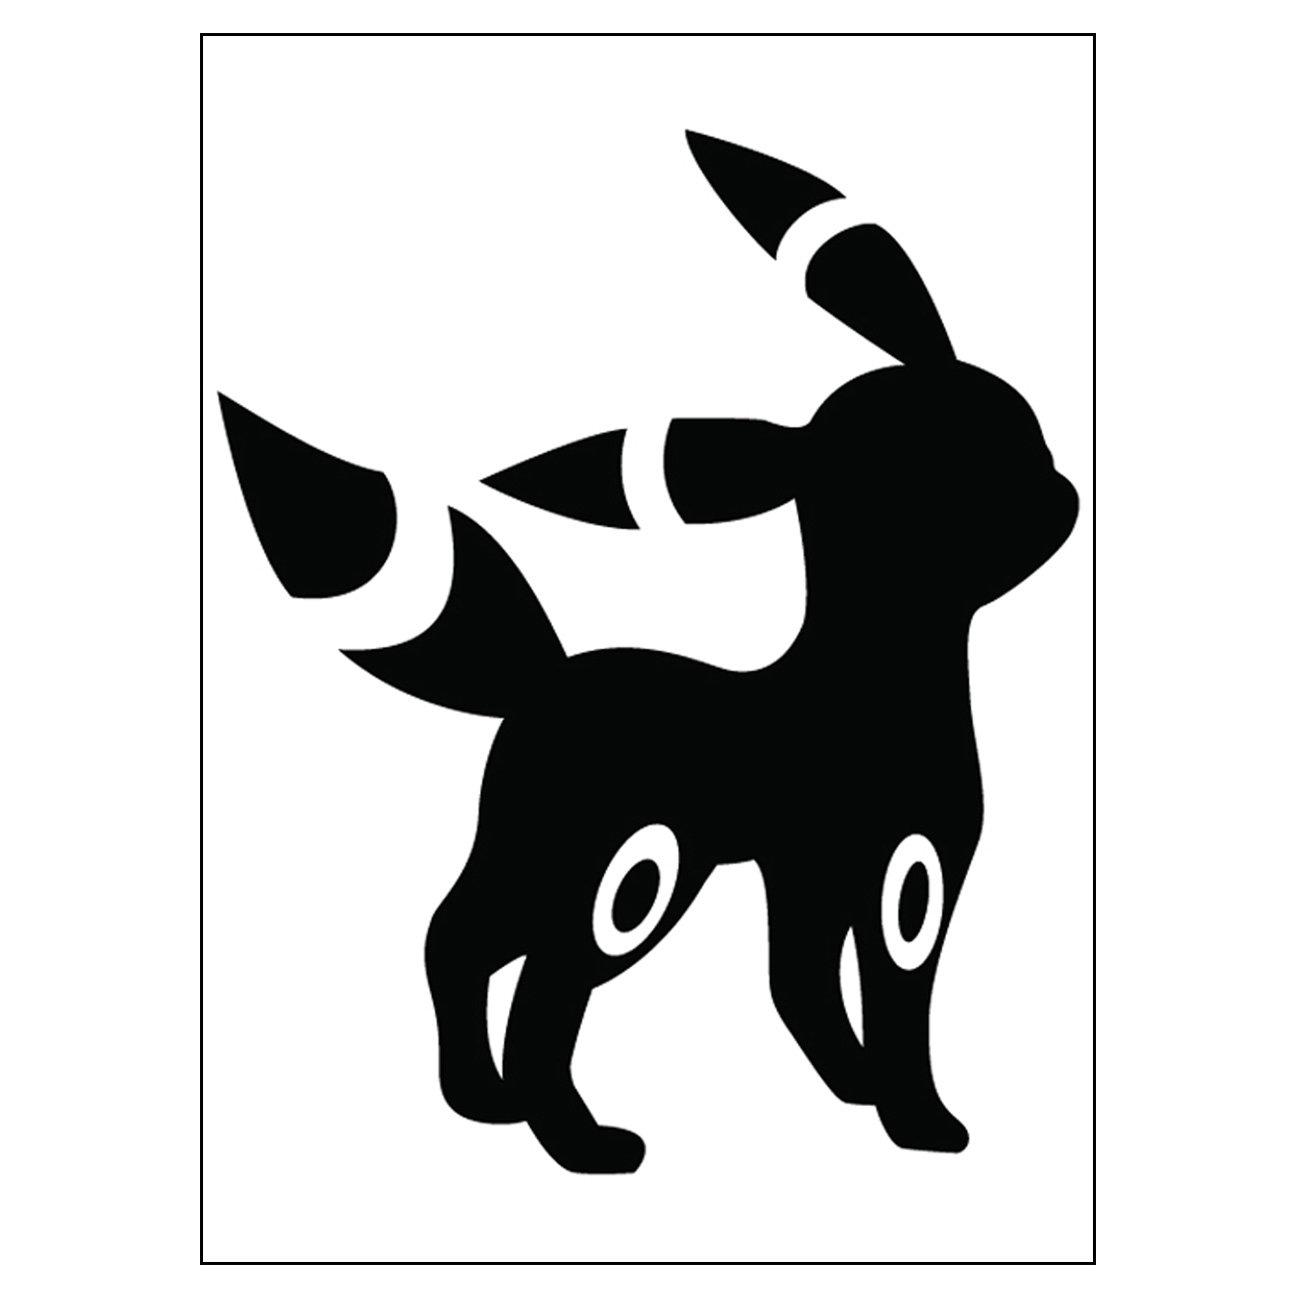 2x Negro Vinilo Calcomania Adhesivo Pokemon Ir Eevee